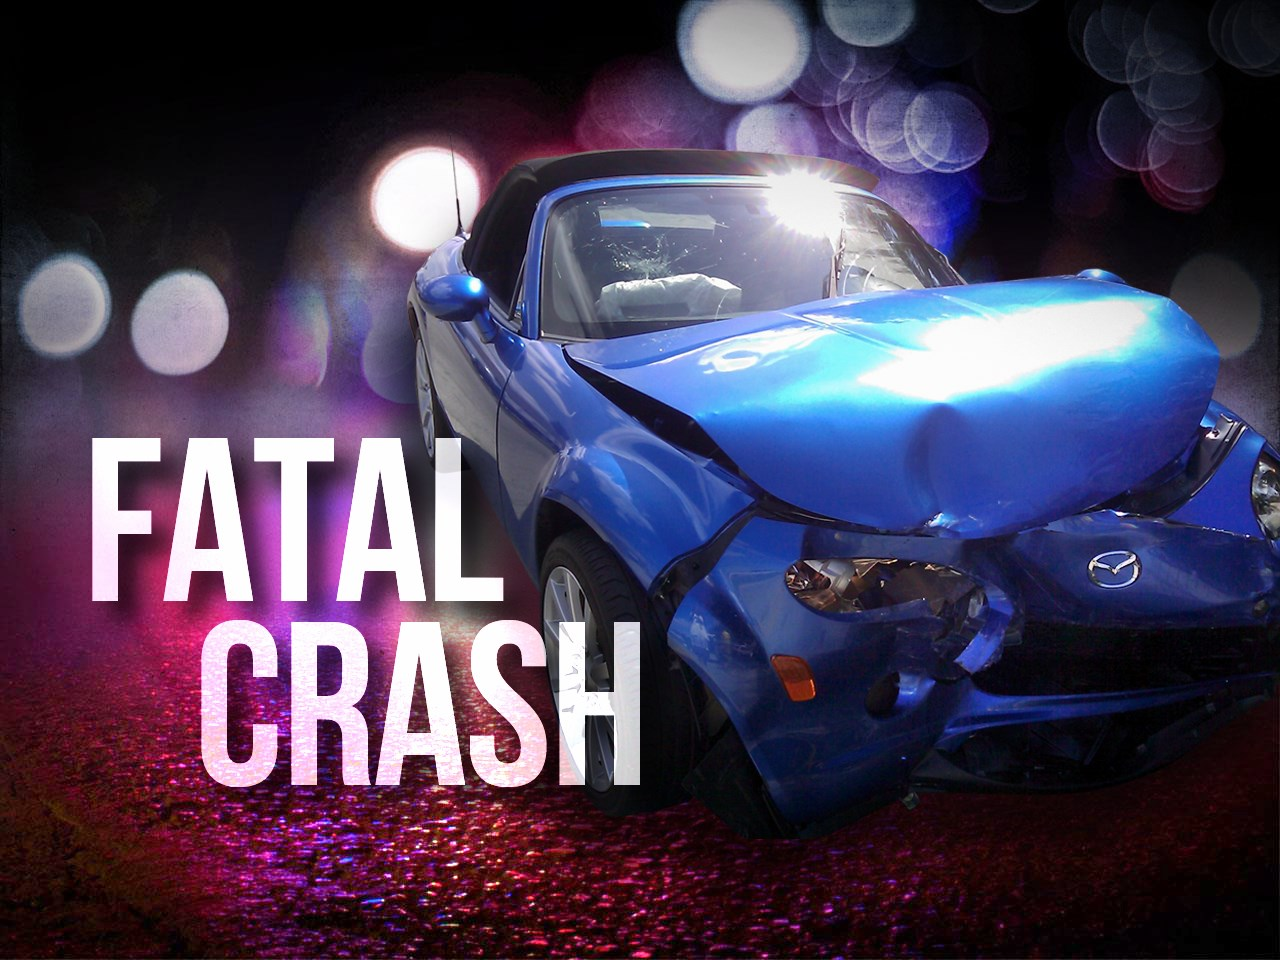 generic fatal crash picture